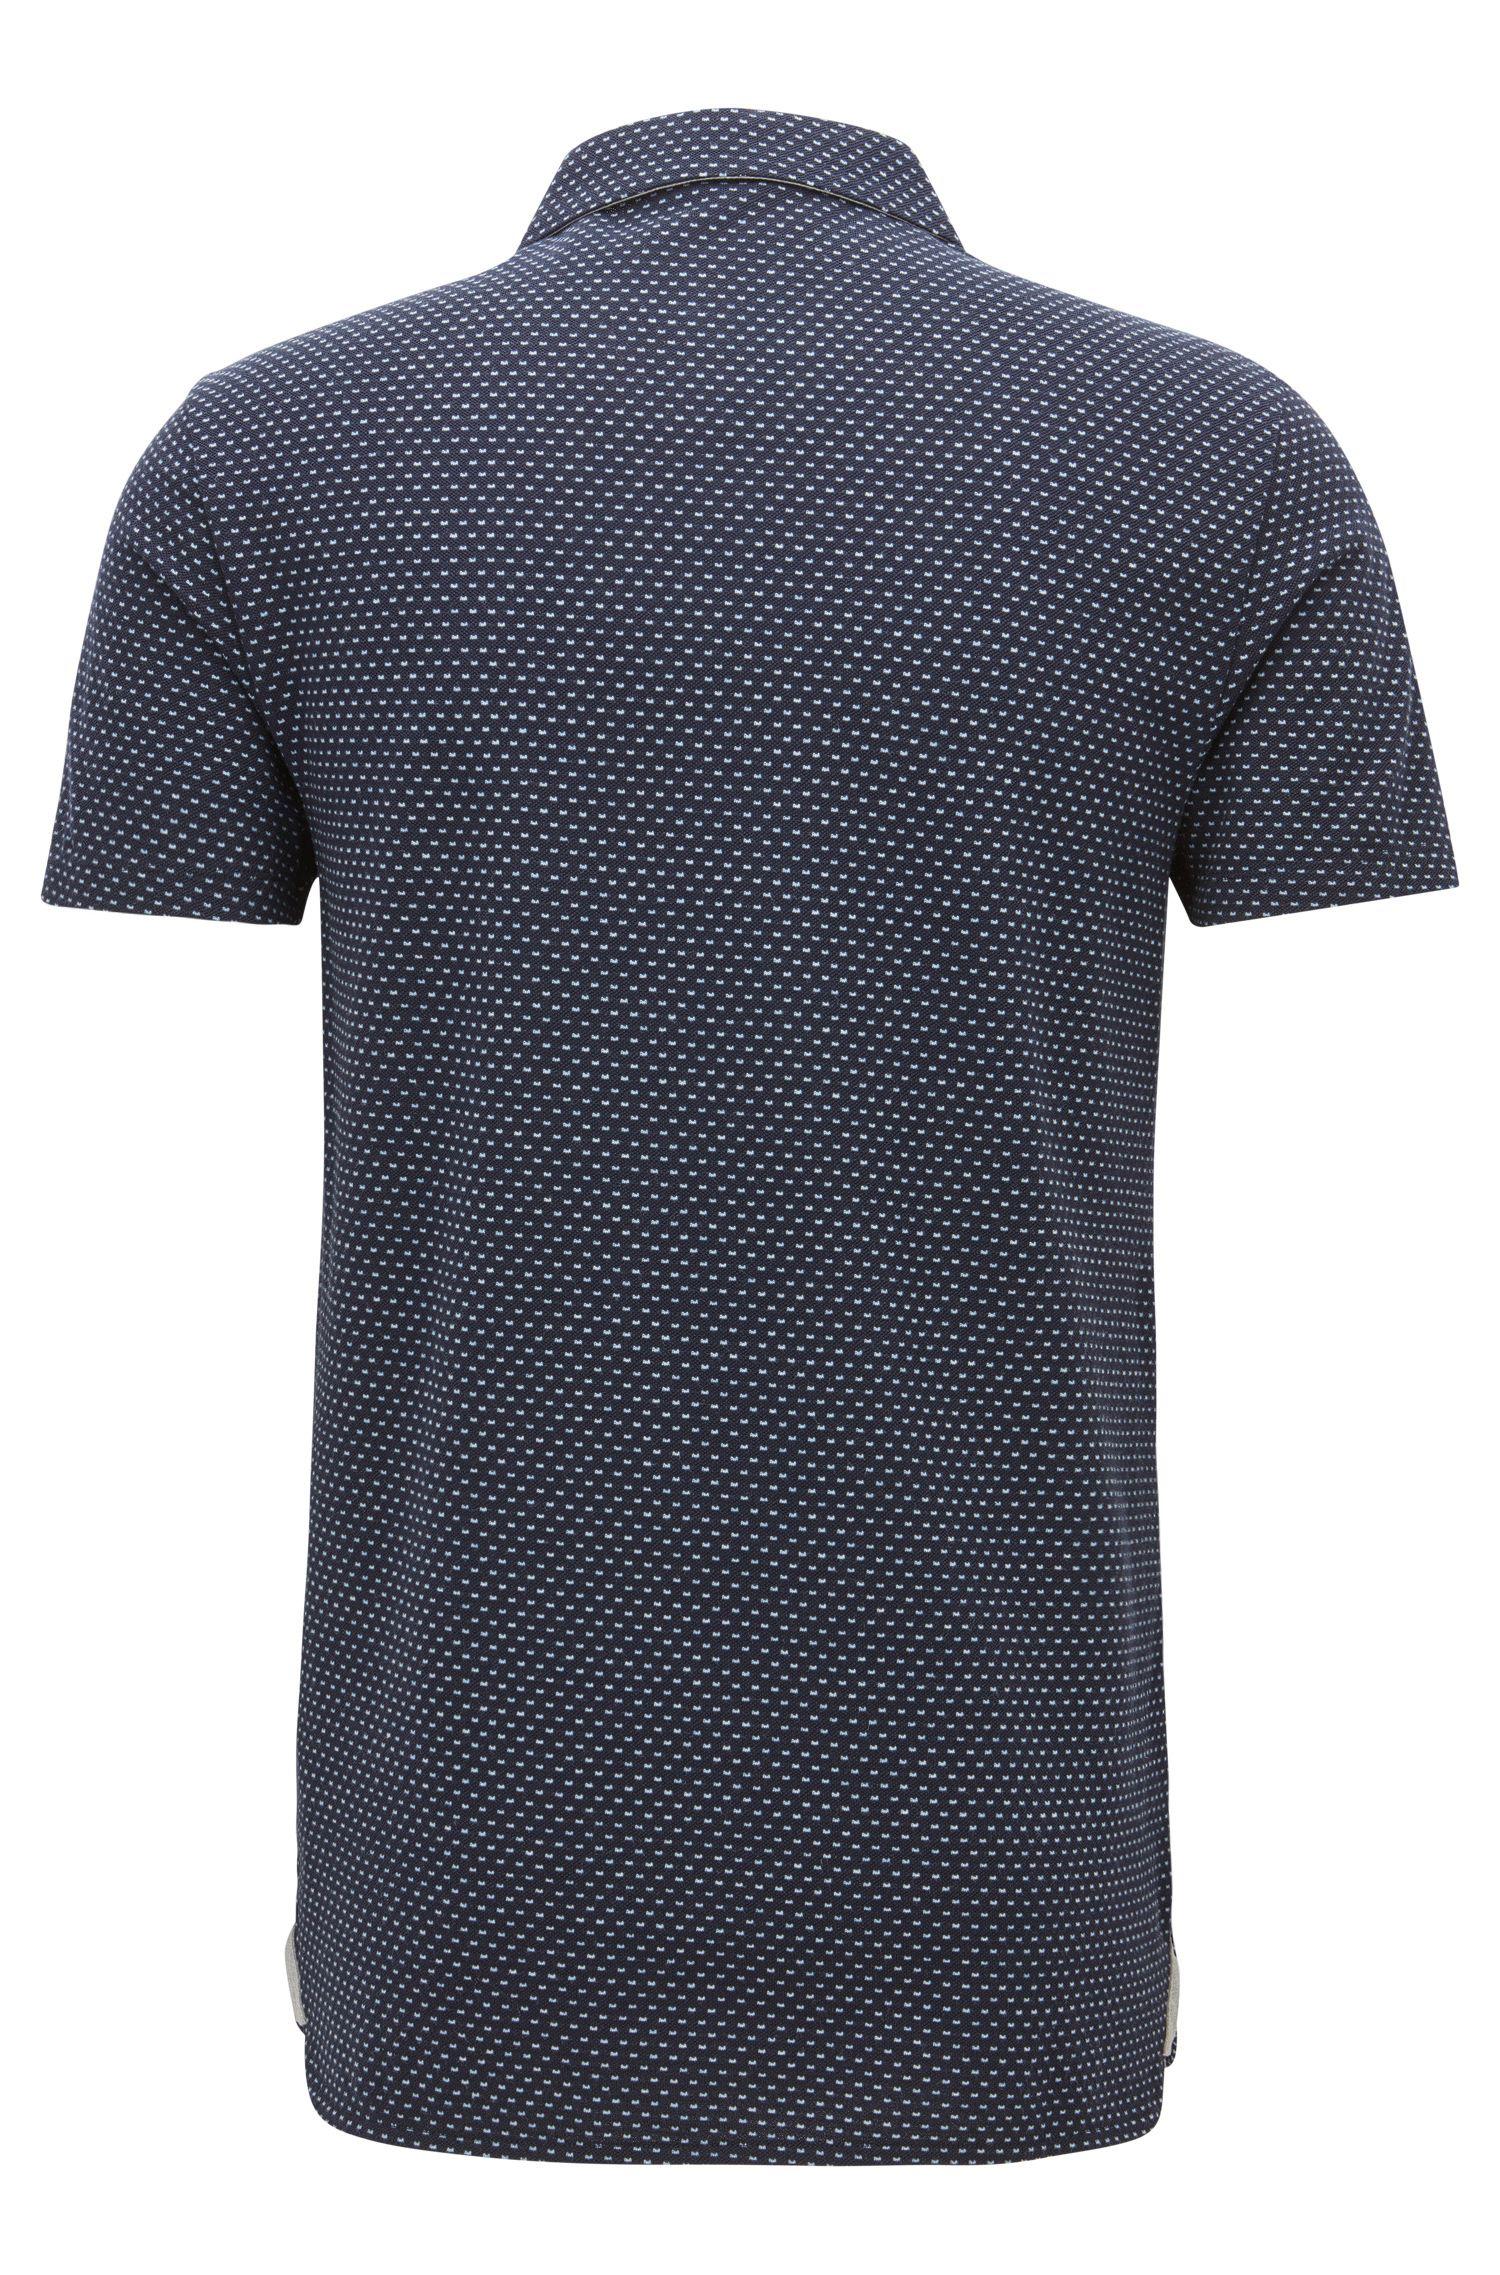 Polka Dot Piqué Cotton Polo Shirt, Regular Fit | Perfect